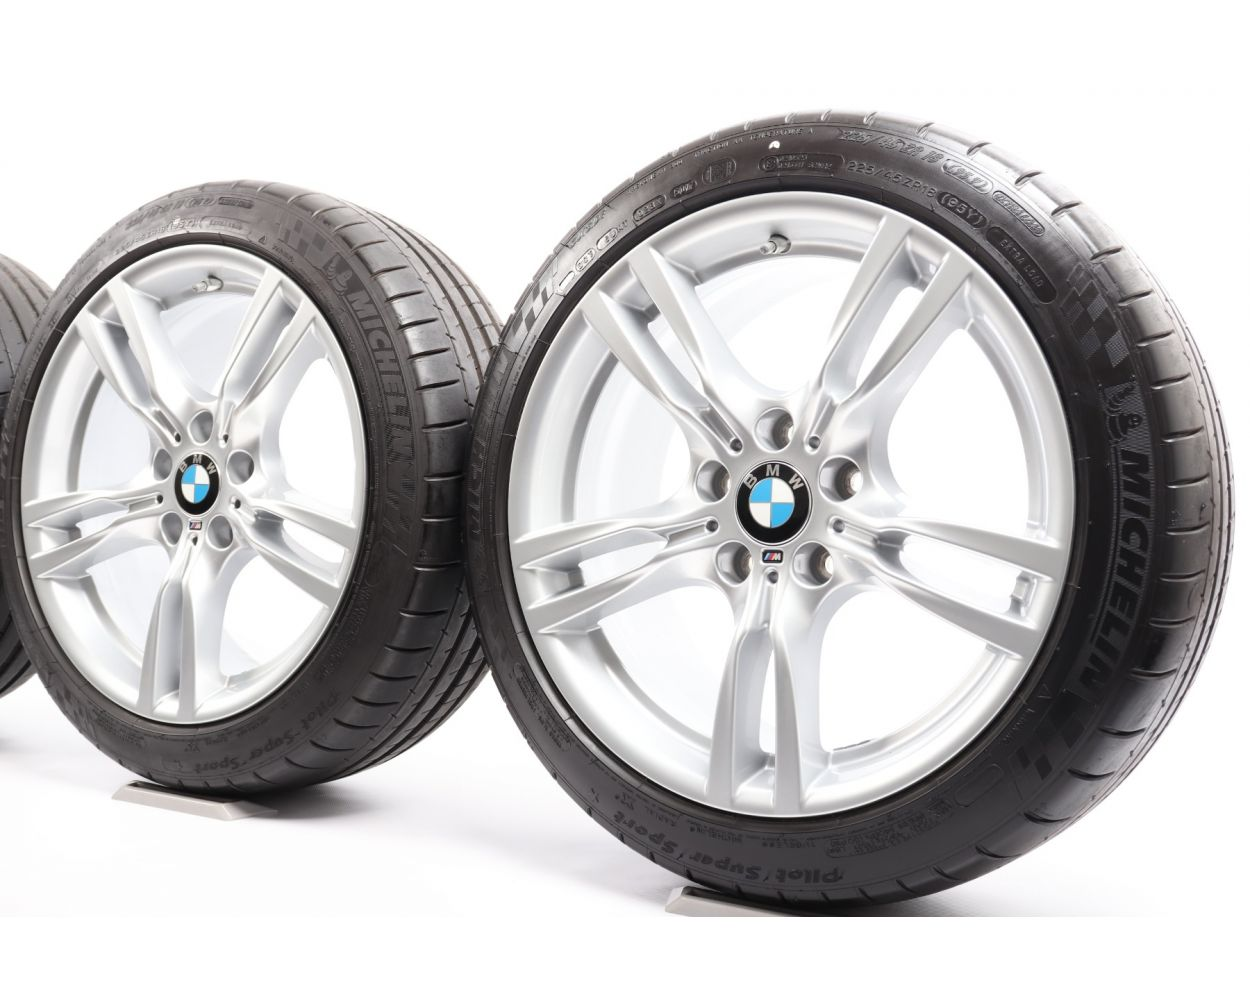 Bmw Summer Wheels 3er F30 F31 4er F32 F33 F36 18 Zoll 400m Star Spoke